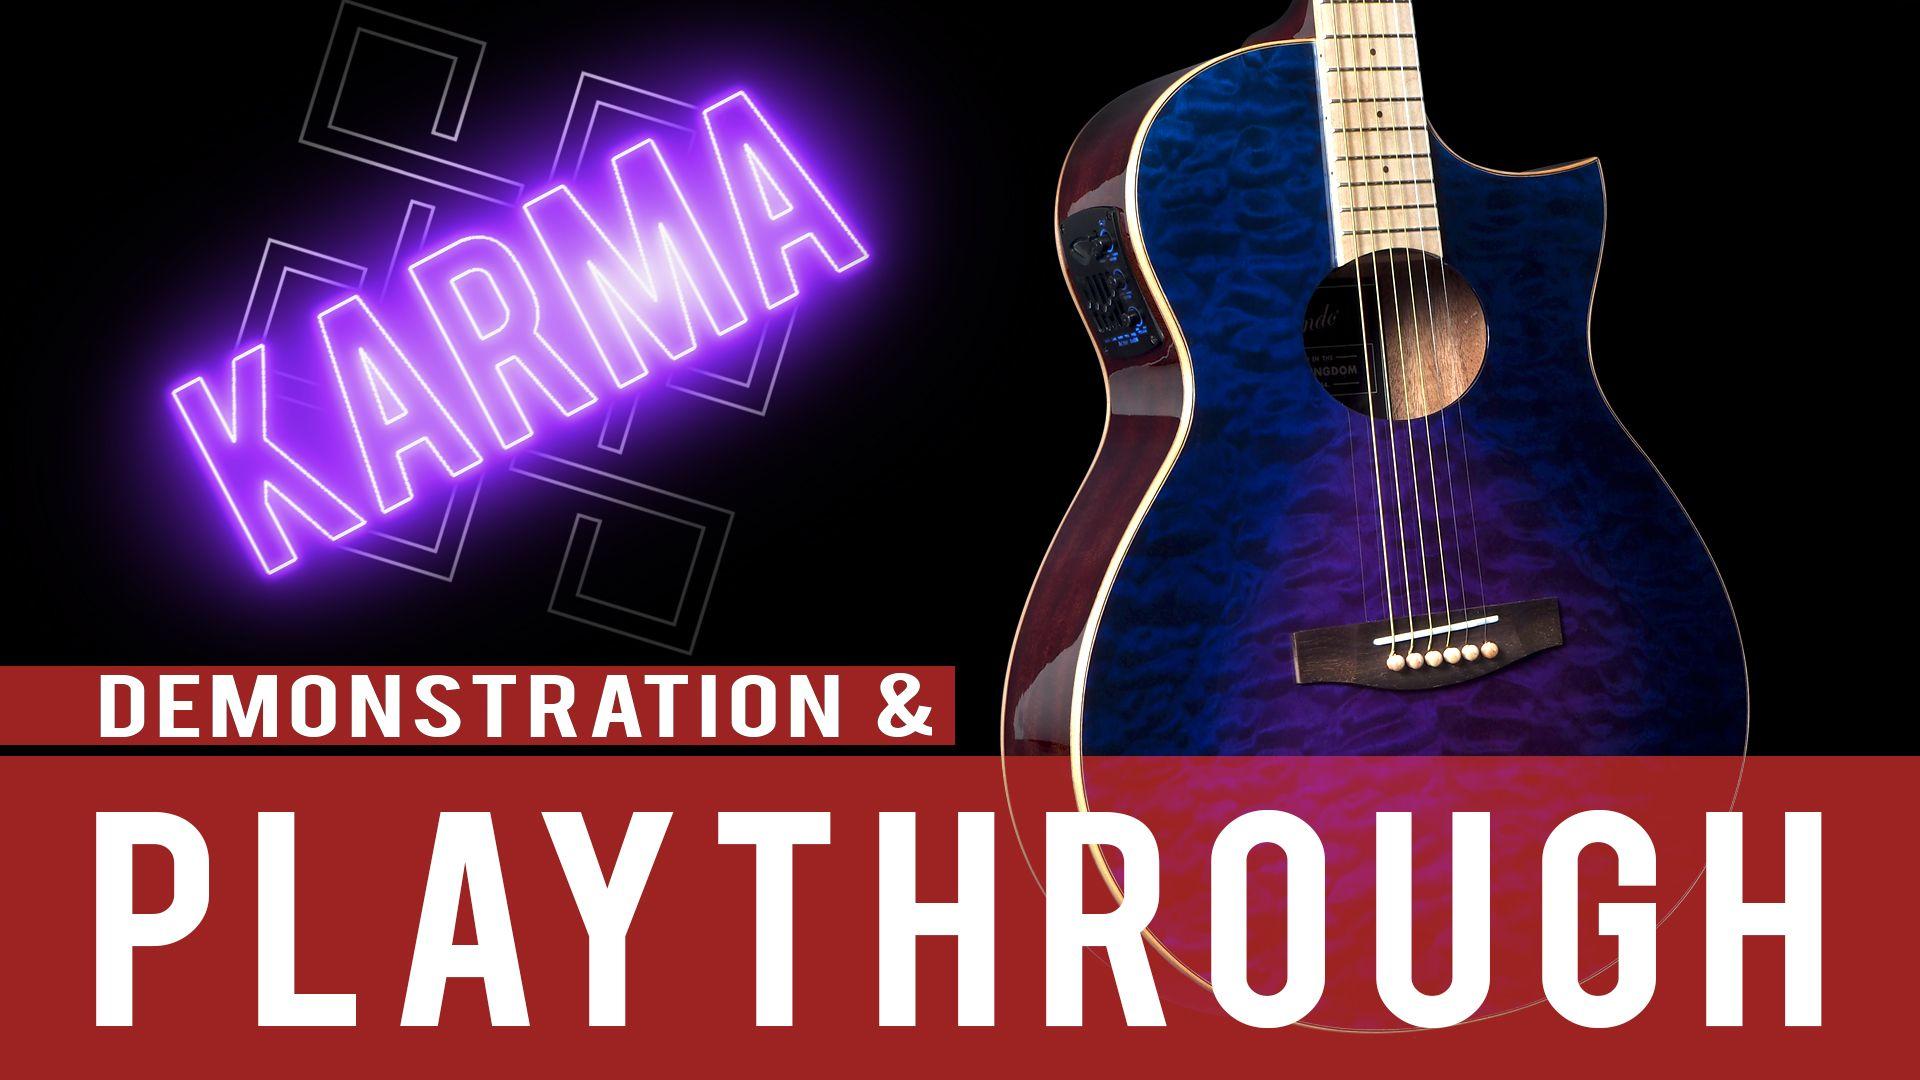 Lindo Karma Slim Body Electro Acoustic Guitar Demonstration Playthrough Electro Acoustic Guitar Guitar Acoustic Guitar